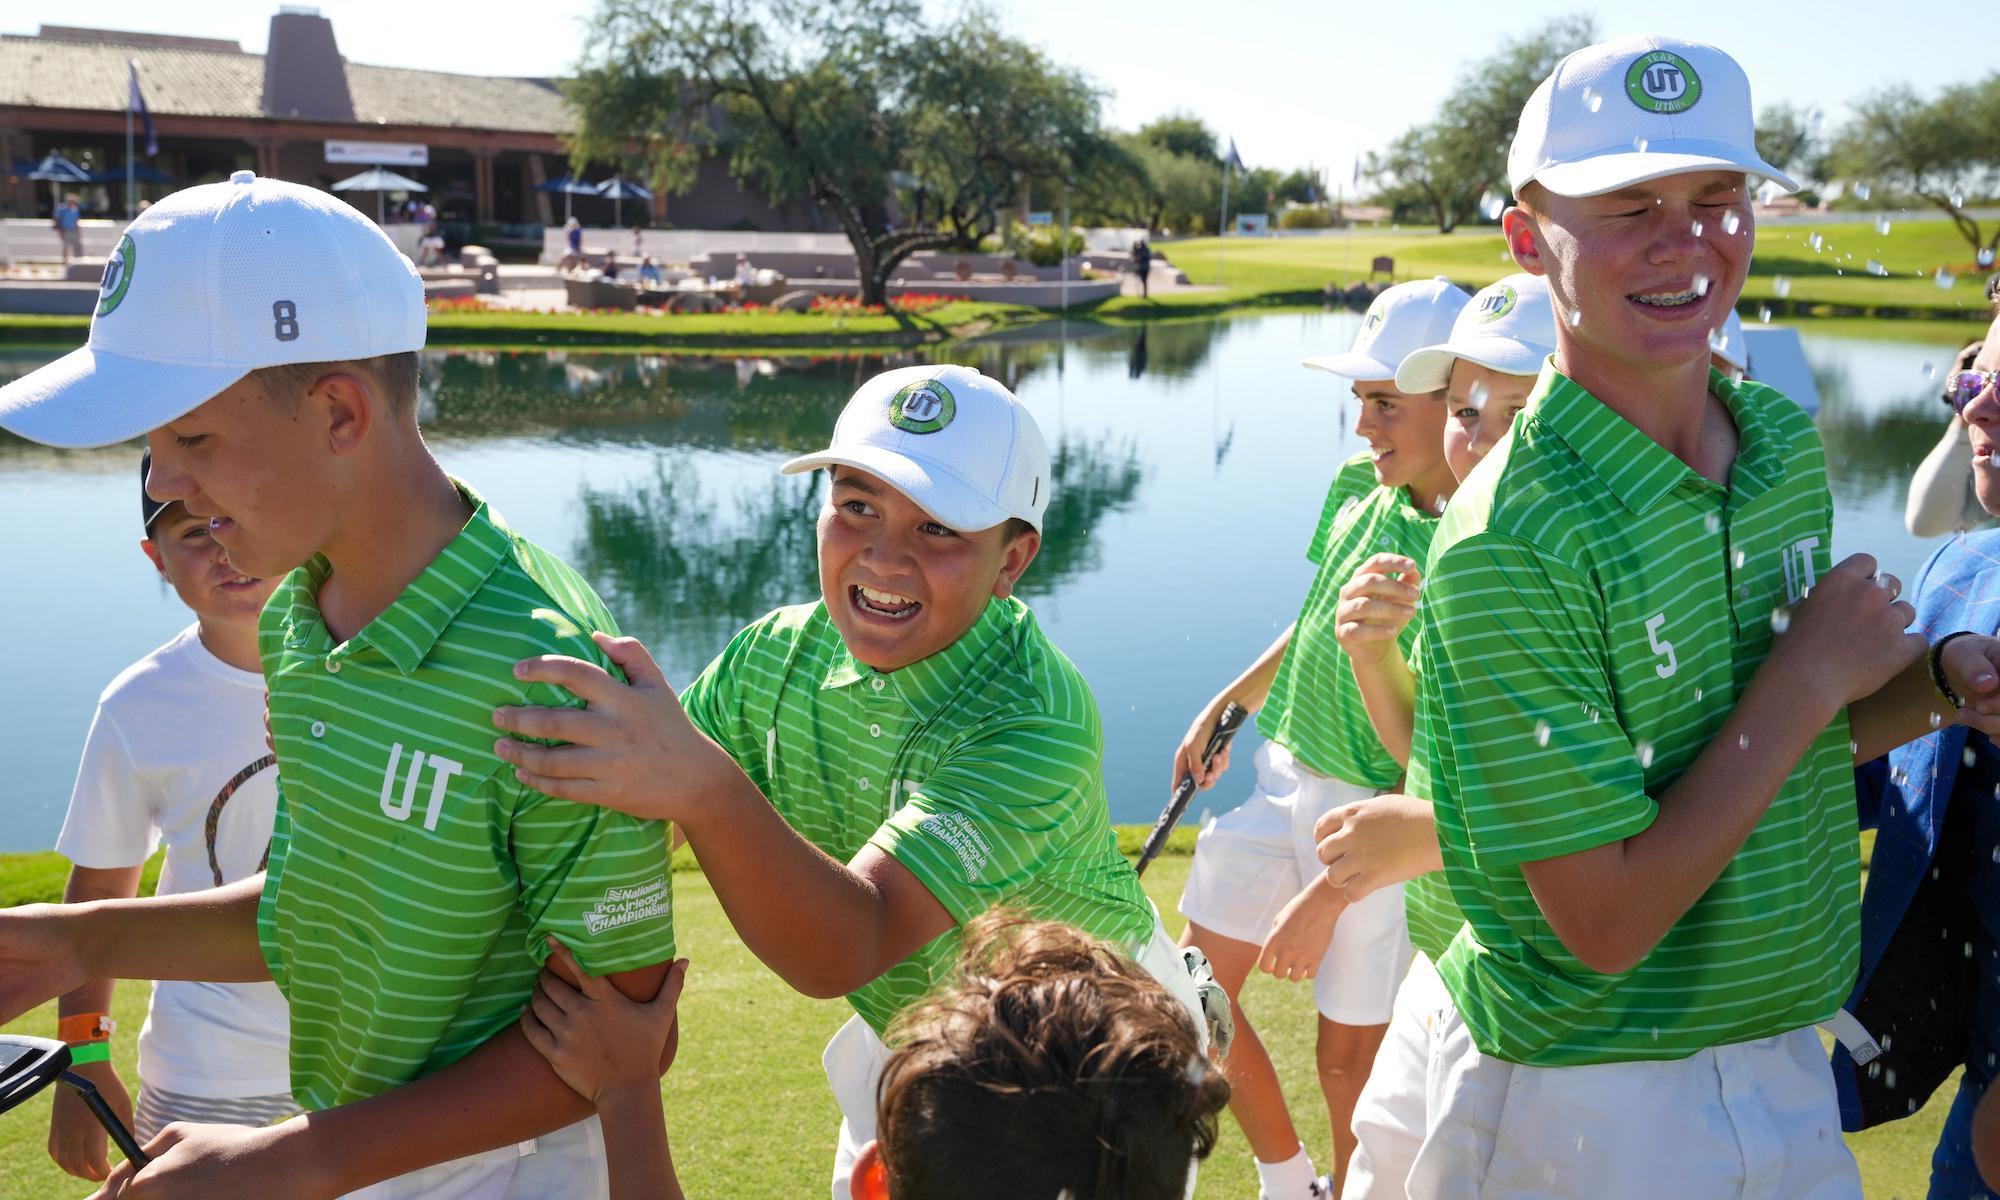 Get Involved with PGA Jr. League!